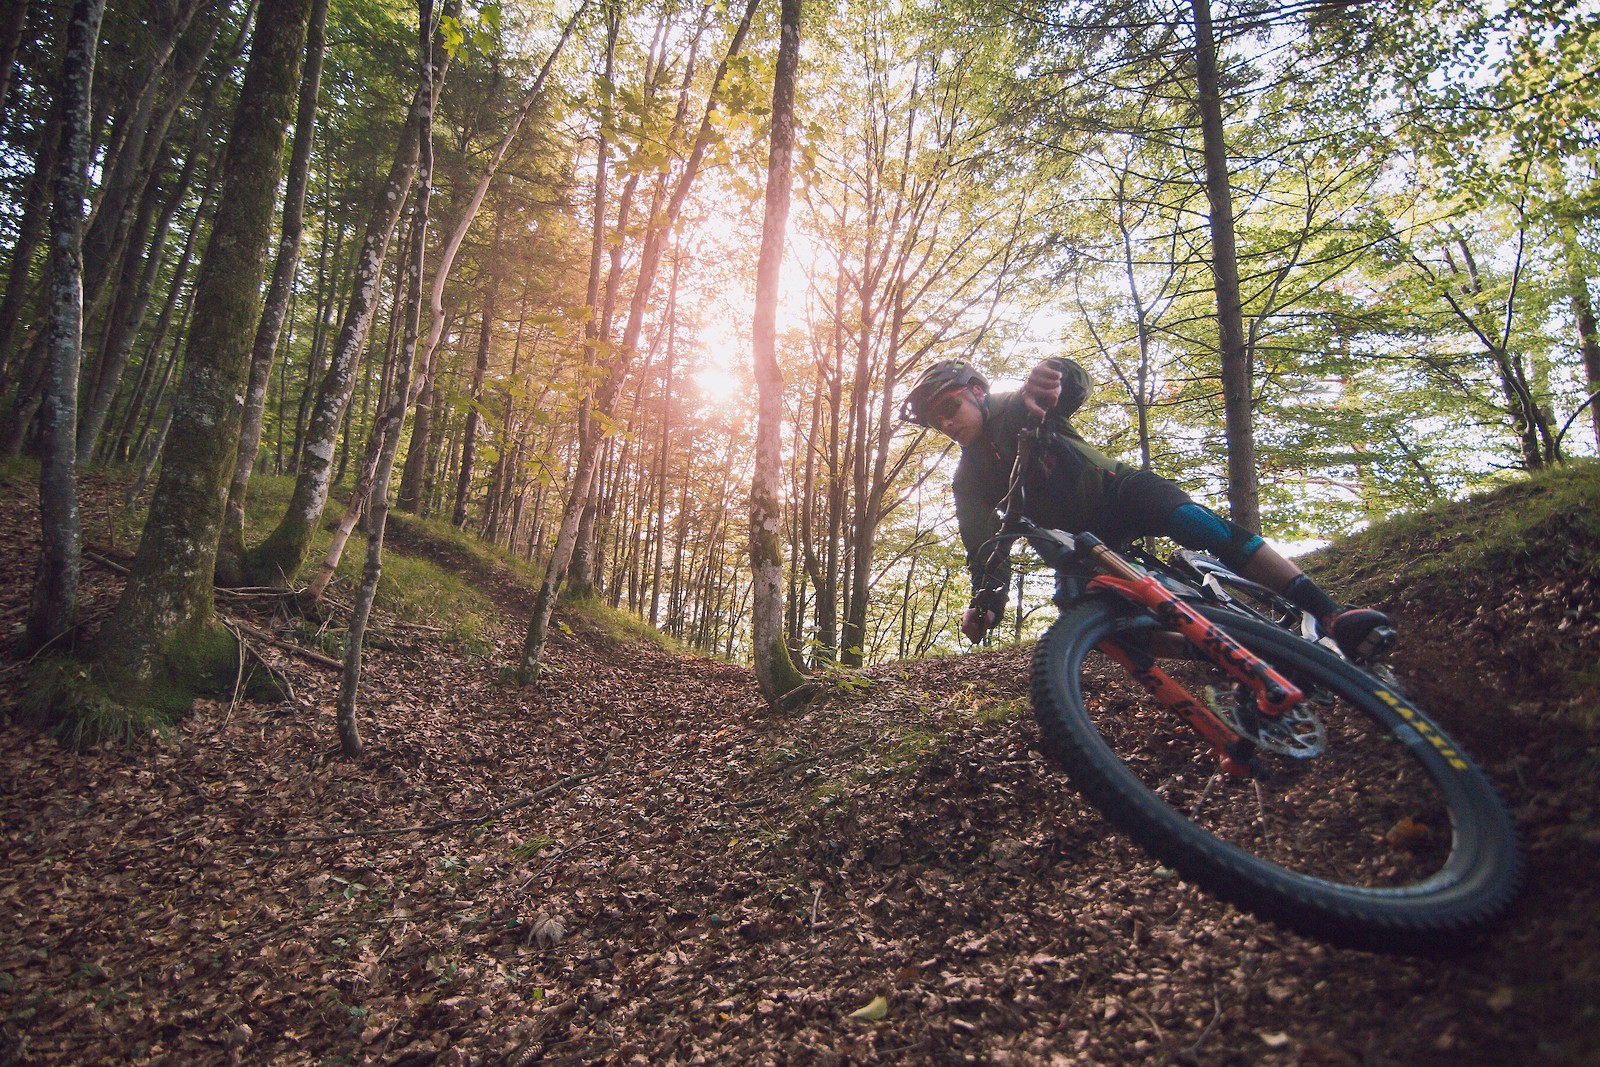 Autumn kicking in - johnseehu - Mountain Biking Pictures - Vital MTB